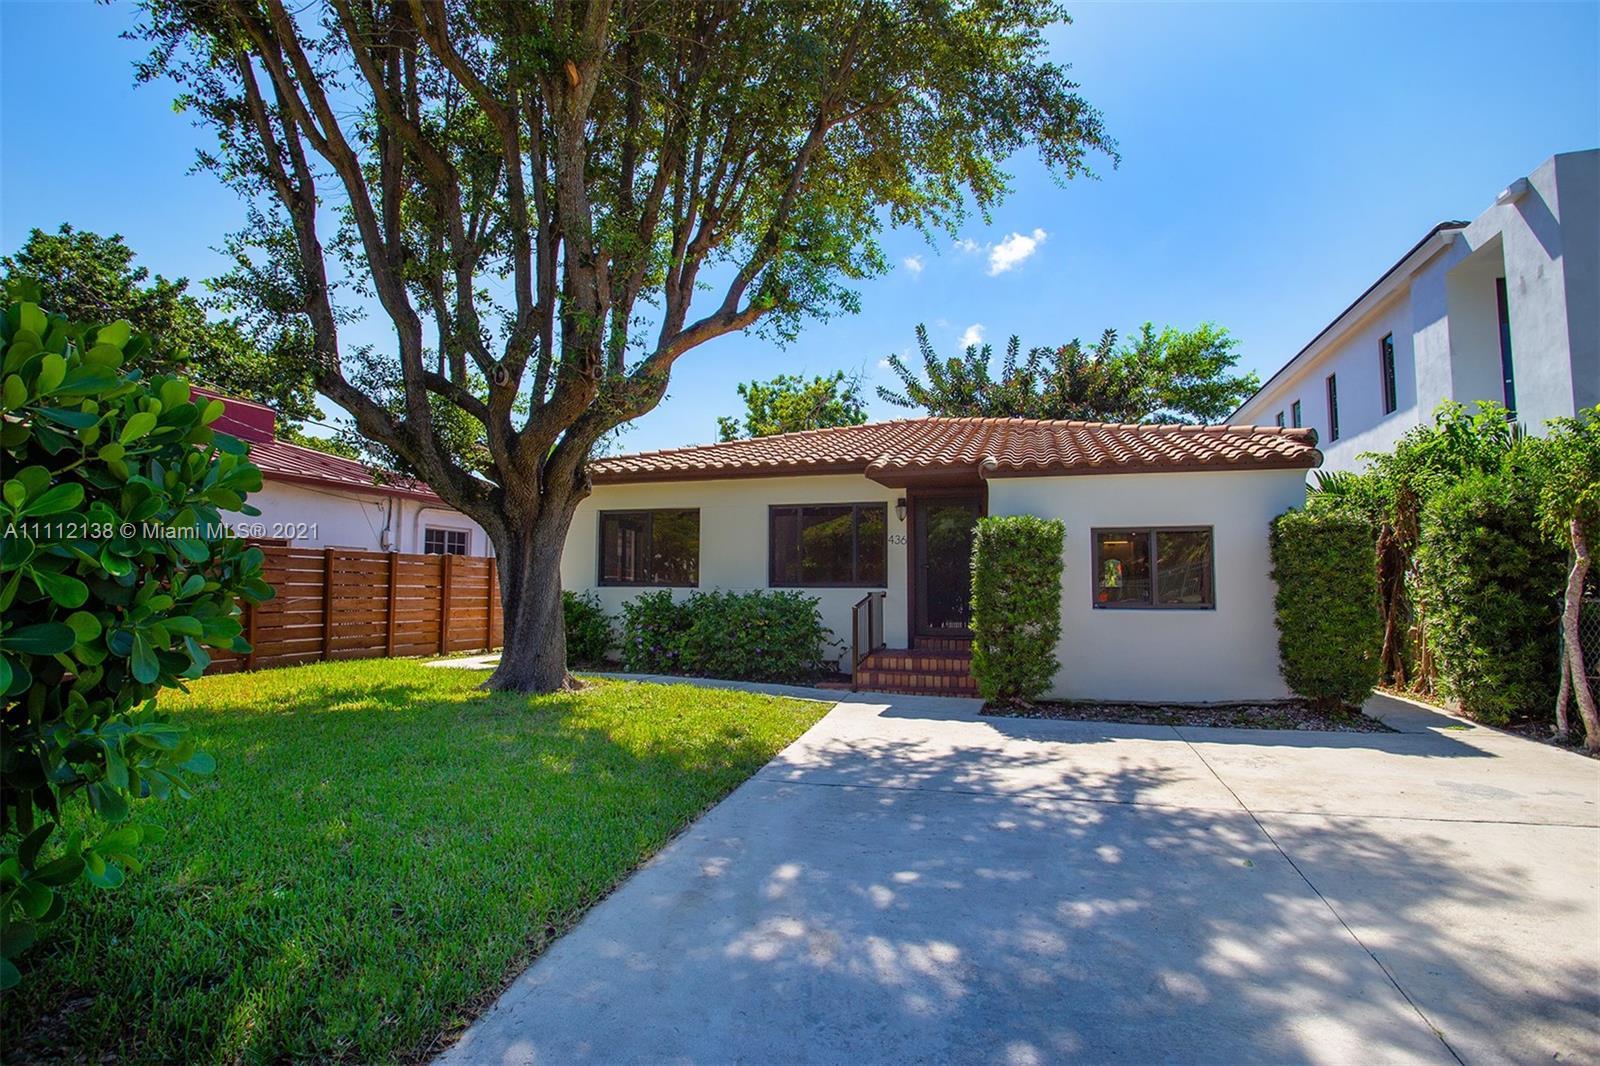 Holleman Park - 436 SW 15th Rd, Miami, FL 33129